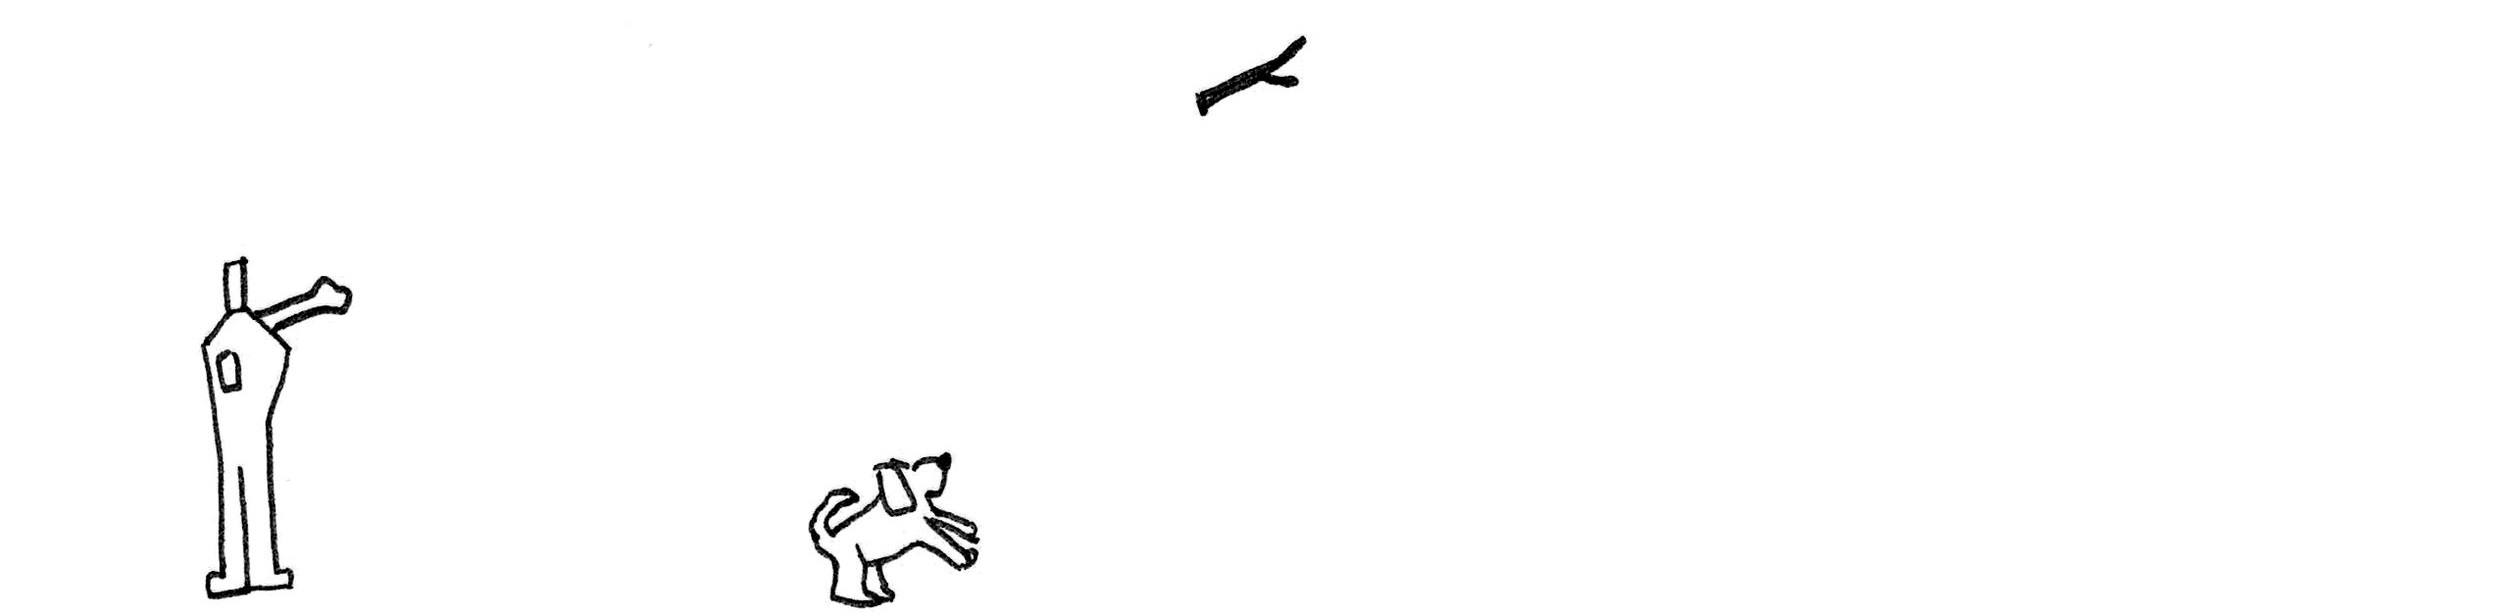 Sketch-Dog-Throw.jpg